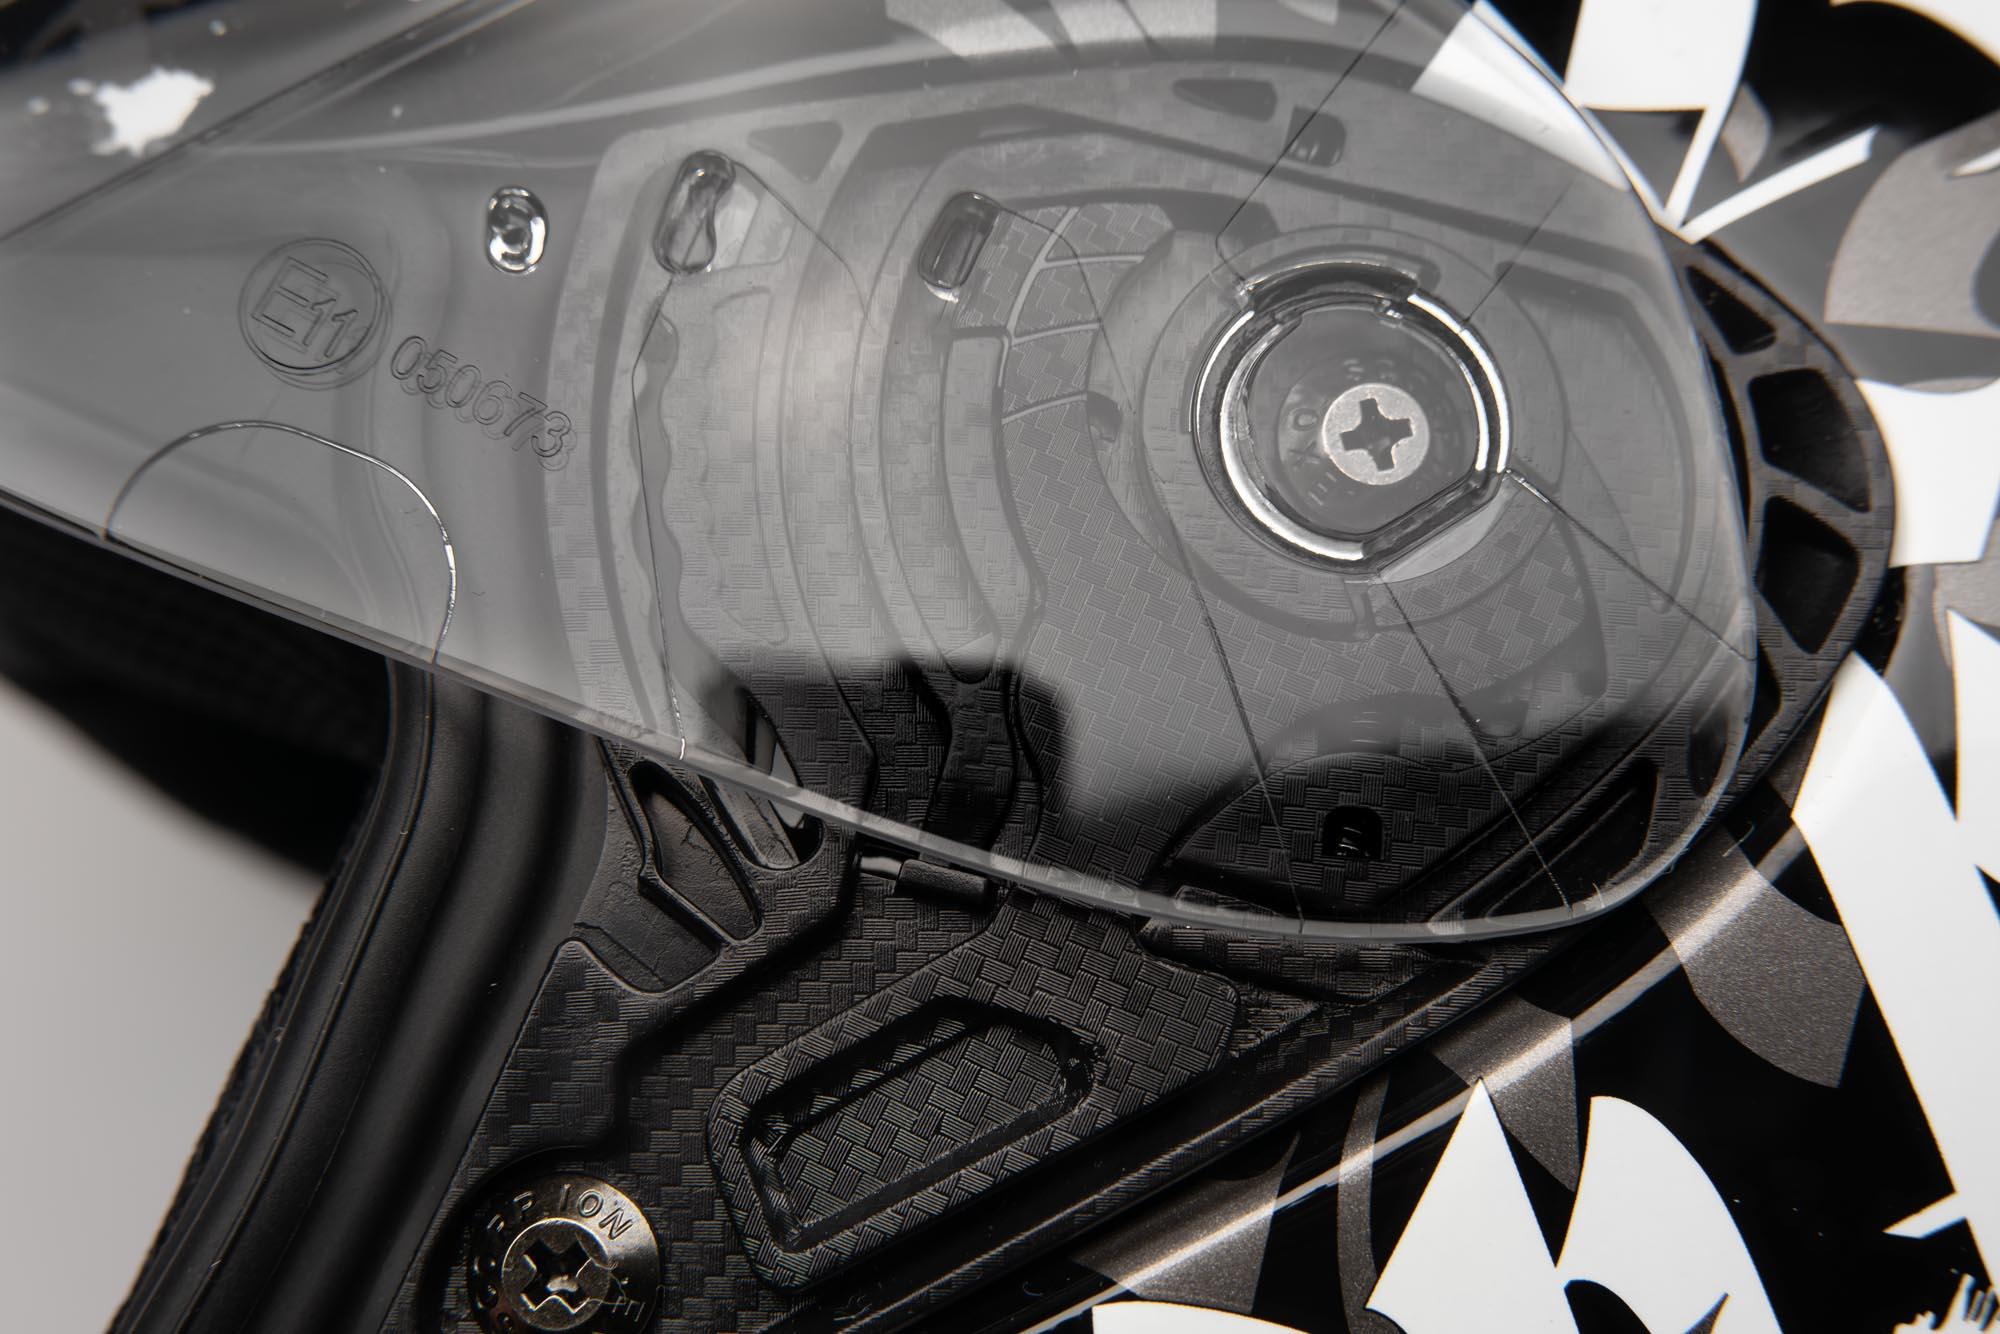 Closeup of the EllipTec™ II quick-release mechanism at the visor pivot.